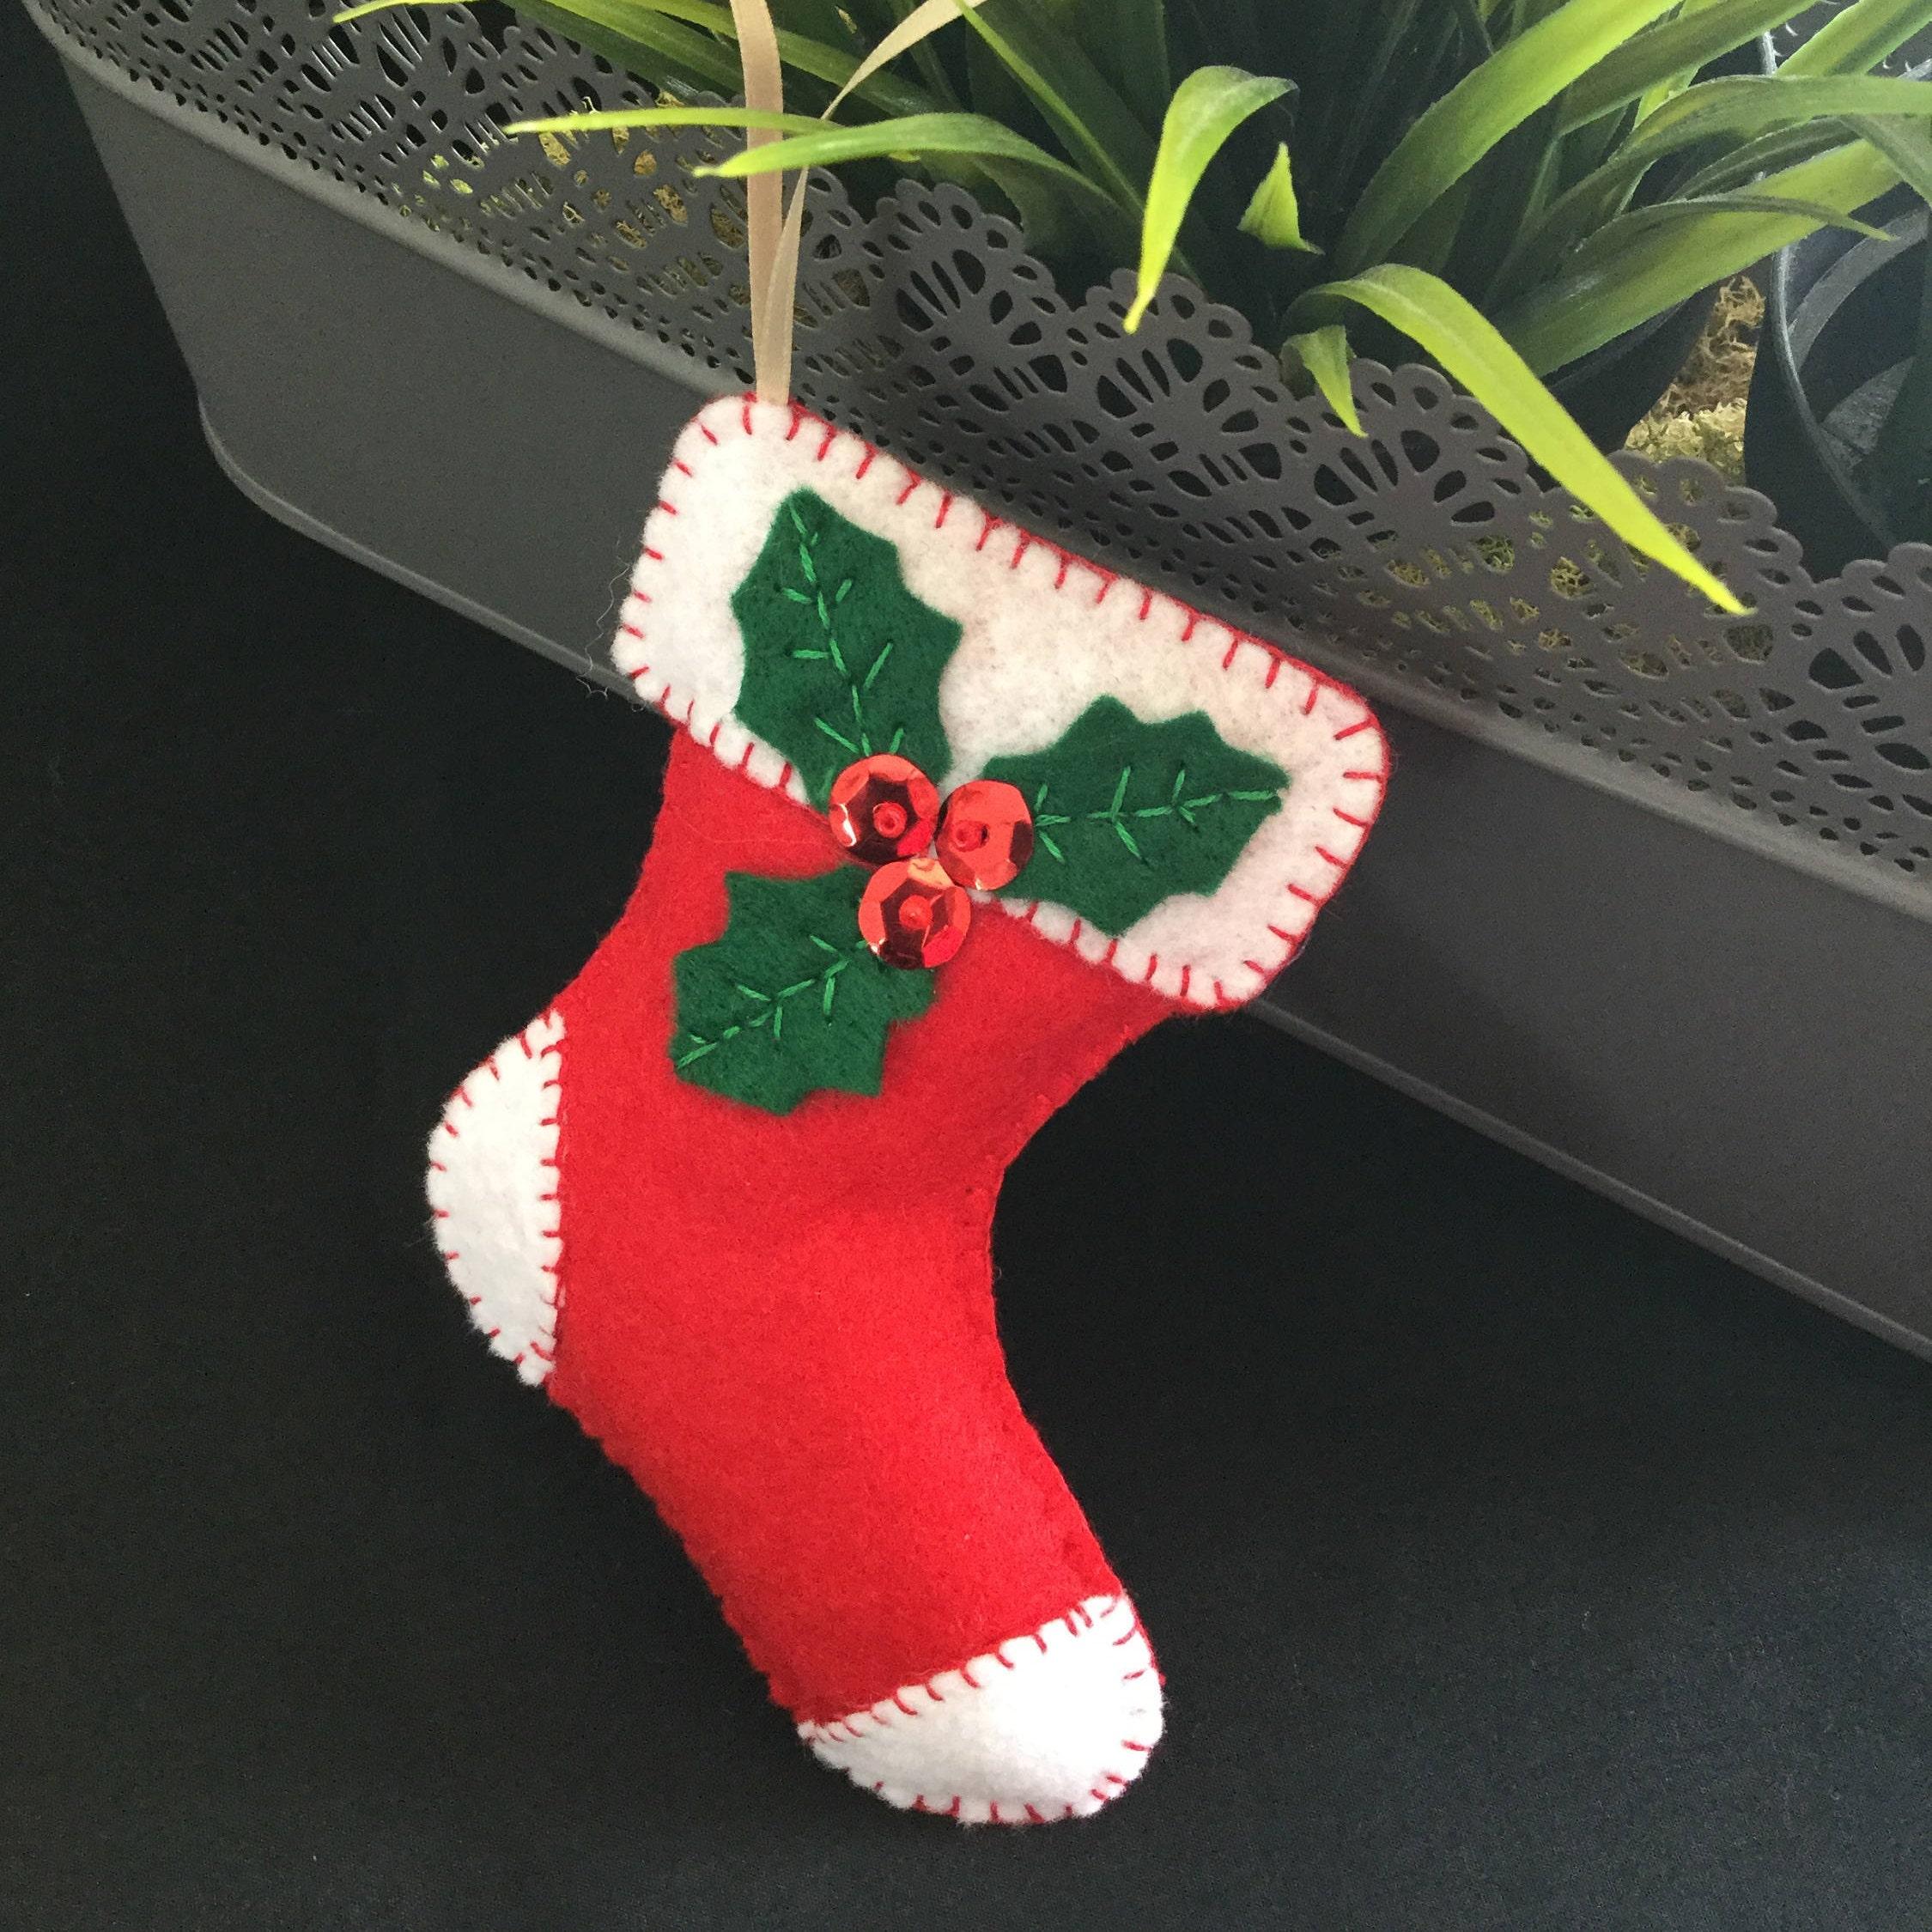 Christmas Tree Ornaments Etsy: Felt Christmas Ornaments Handmade Christmas Tree Ornaments